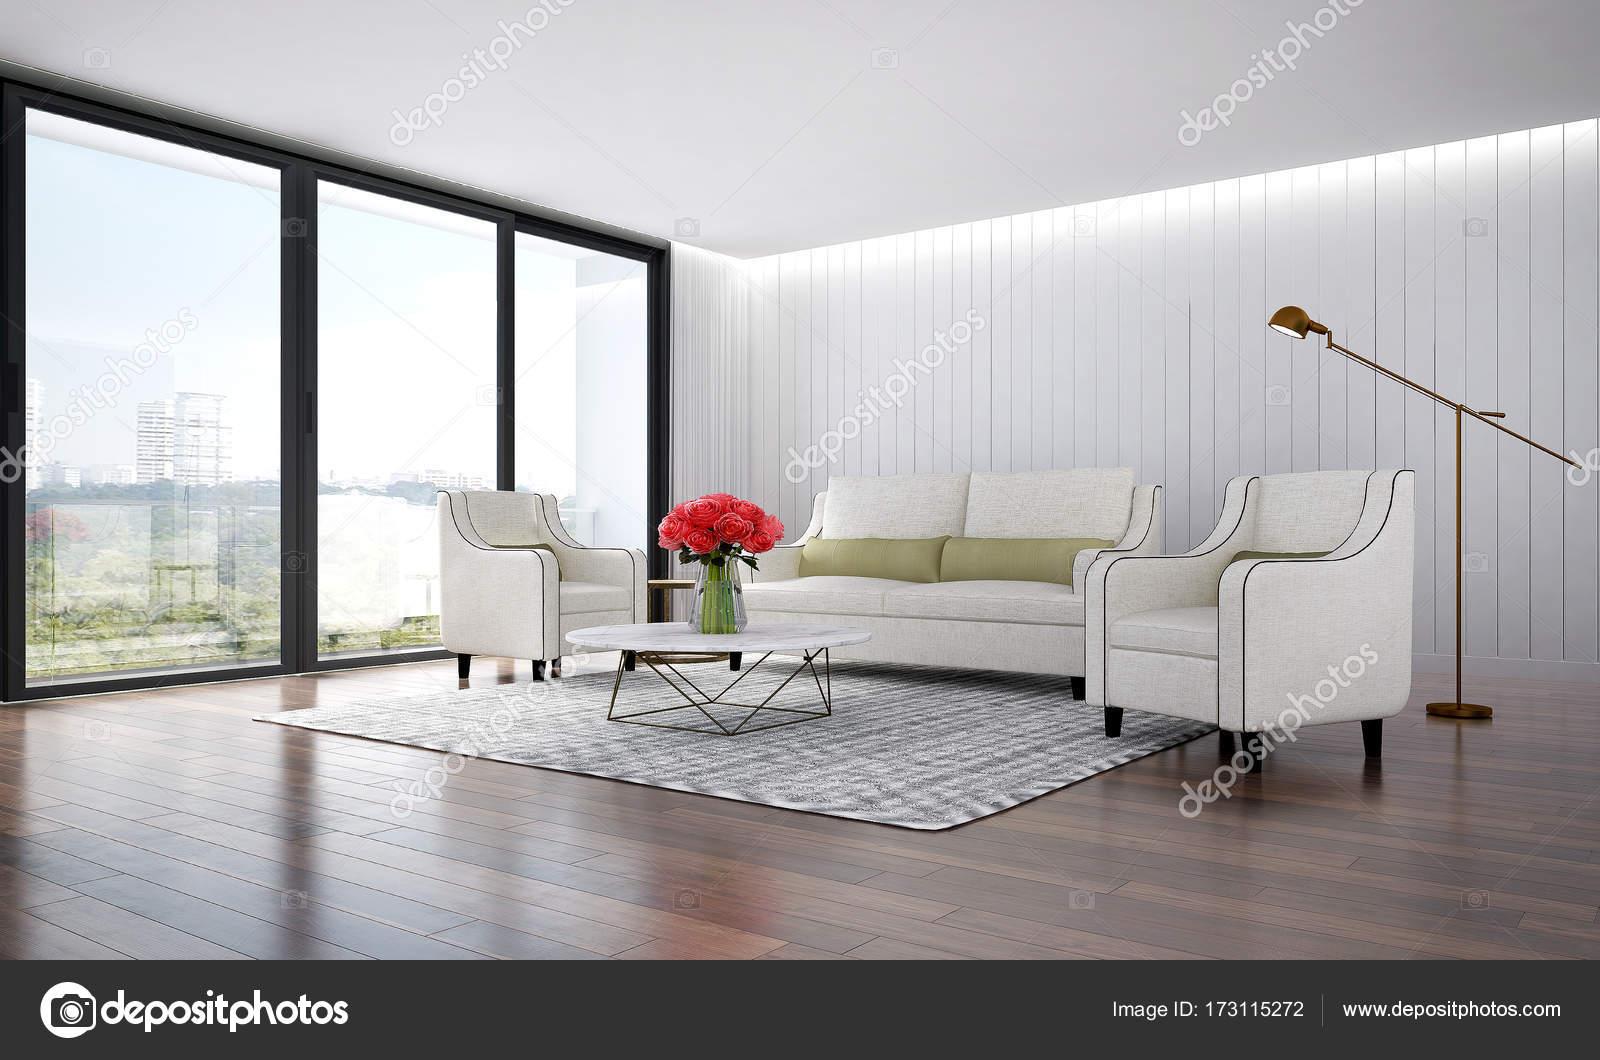 conception dintrieurs rendu 3d de salon image de teeraphan